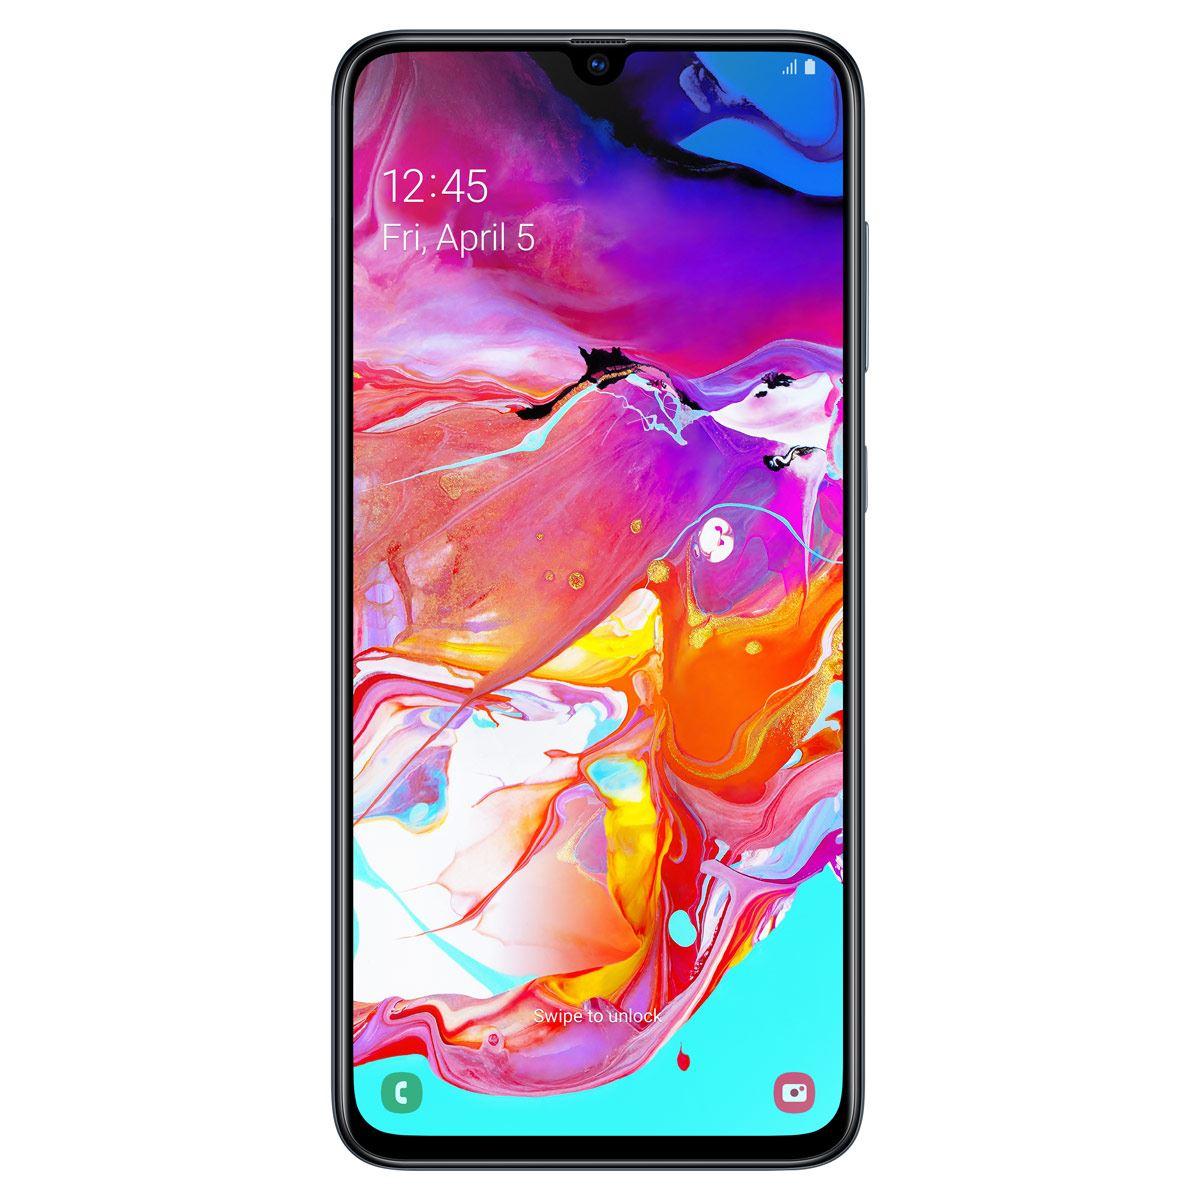 Celular Samsung A705 Galaxy A70 Color Negro R9 (Telcel)